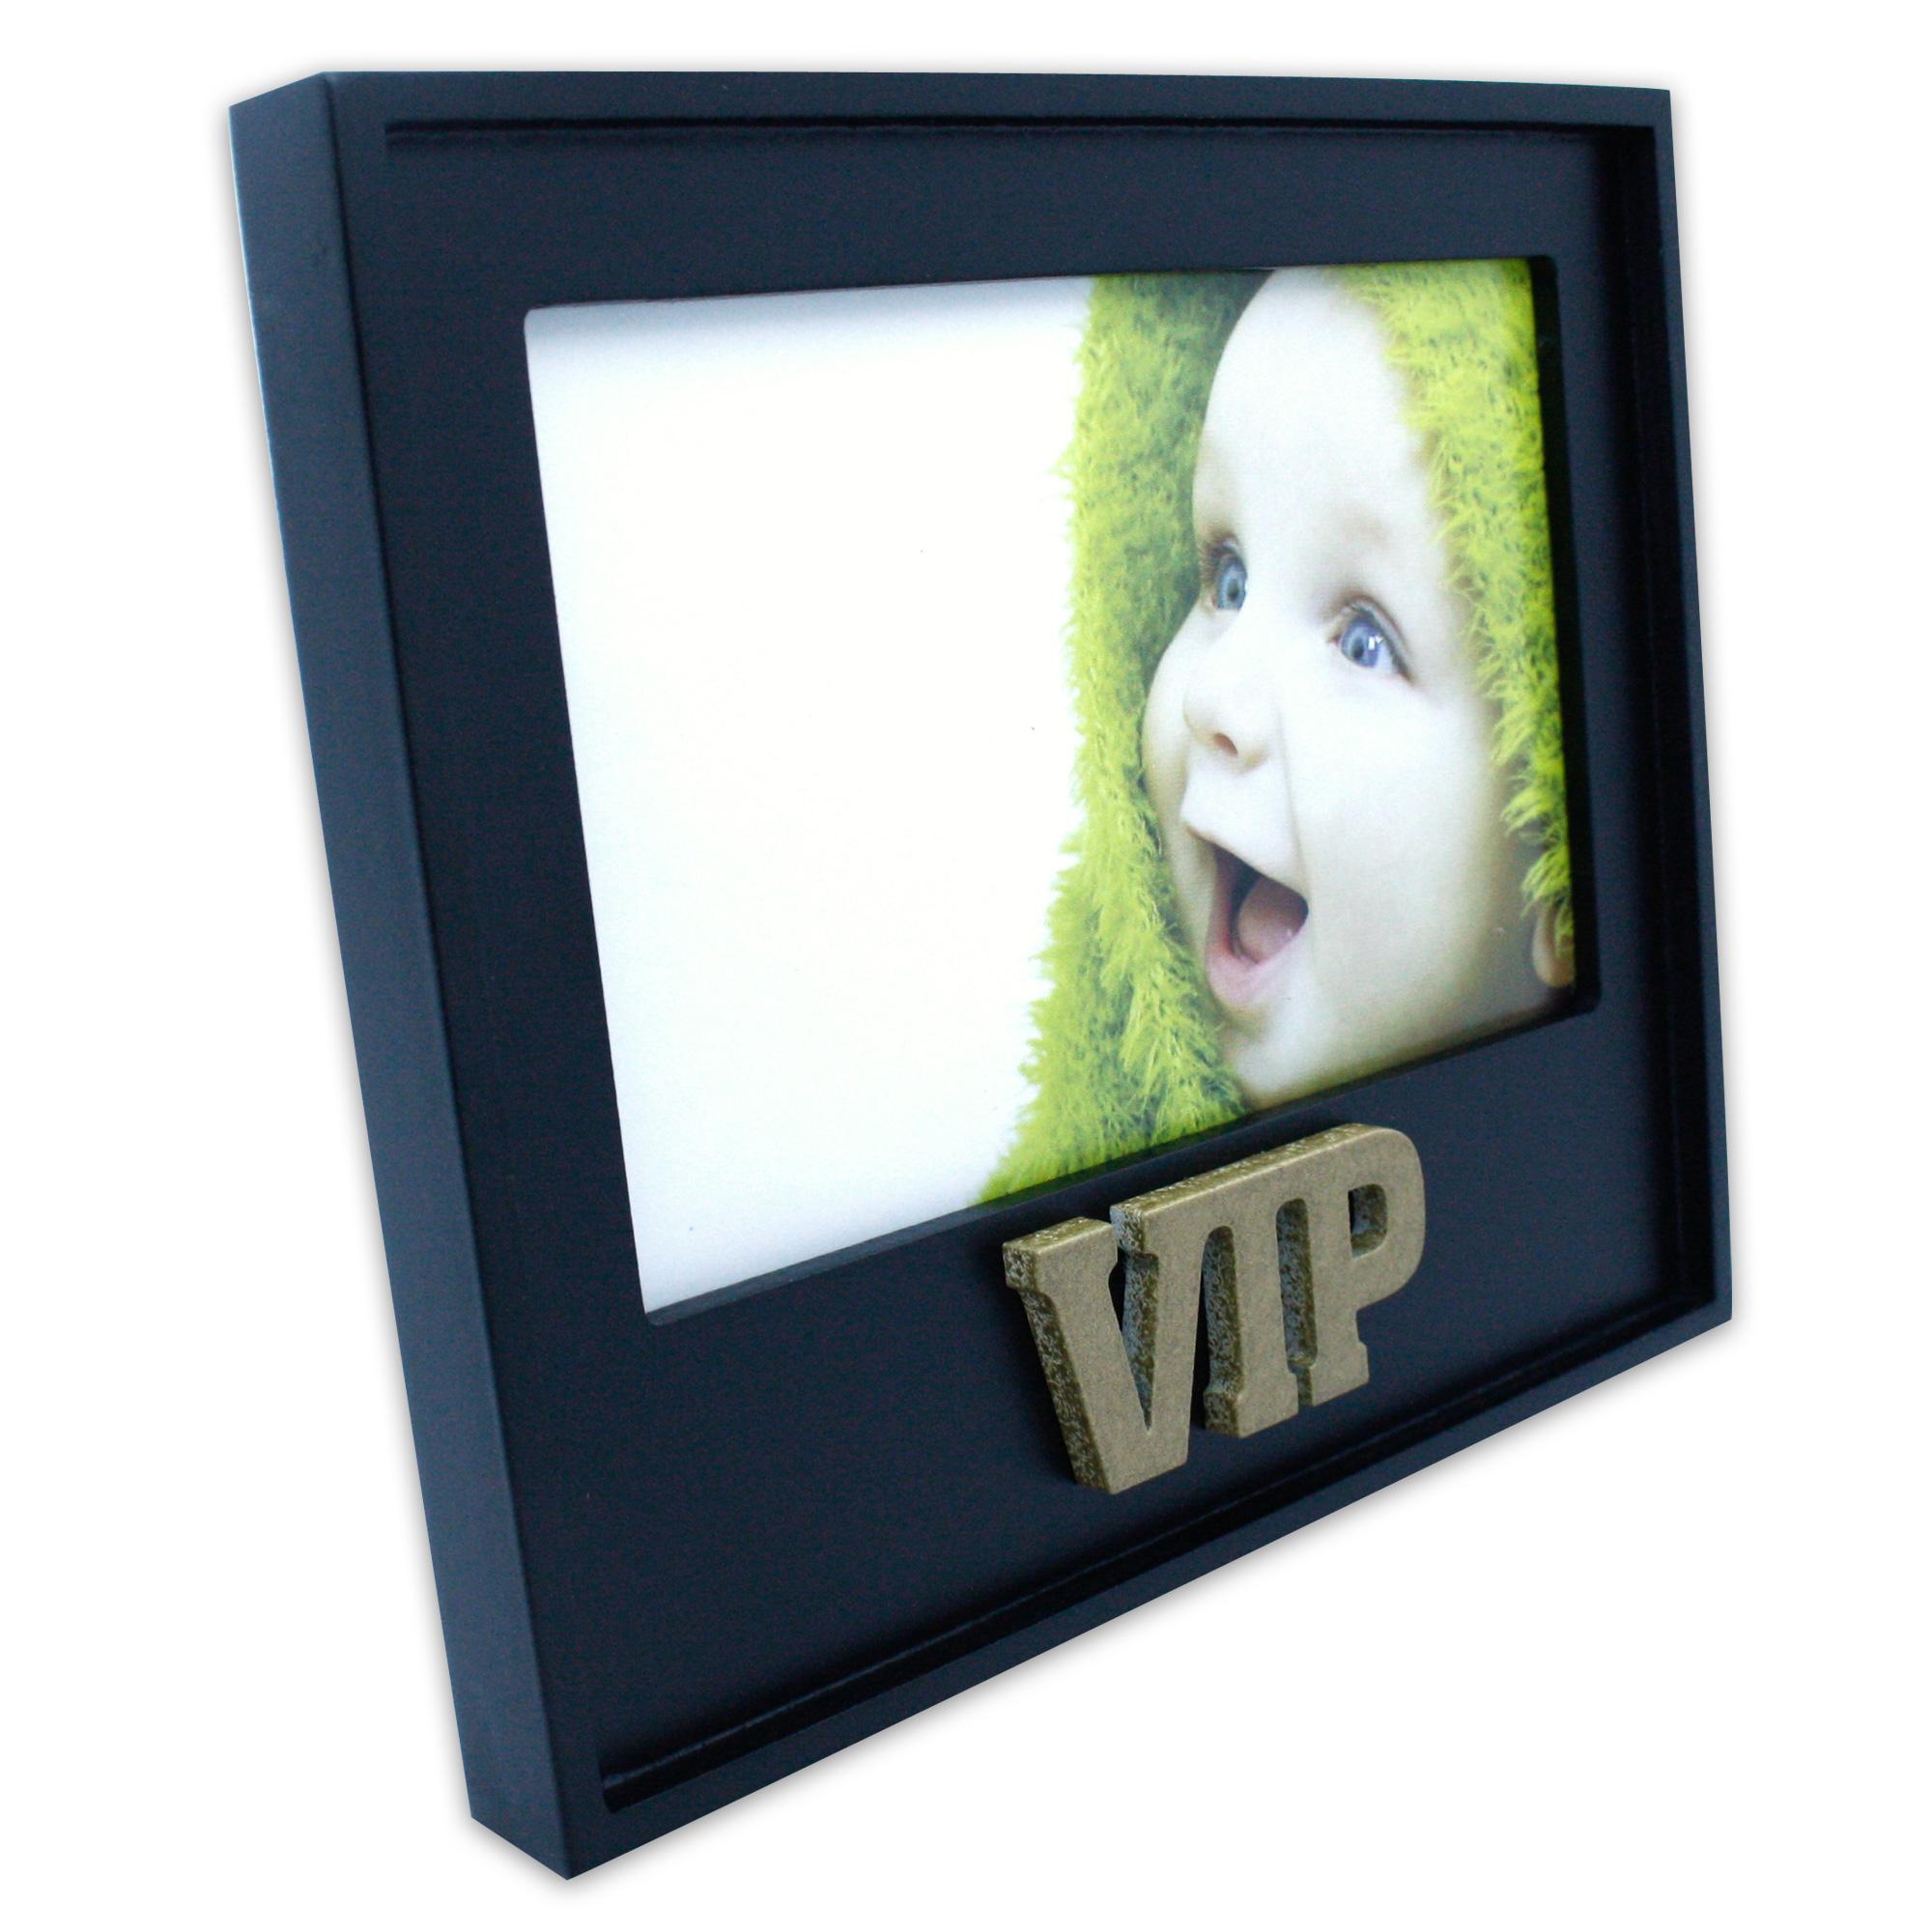 vip 3d bilderrahmen fotorahmen einzelrahmen fotohalter holzrahmen schwarz gold 4250953424736 ebay. Black Bedroom Furniture Sets. Home Design Ideas